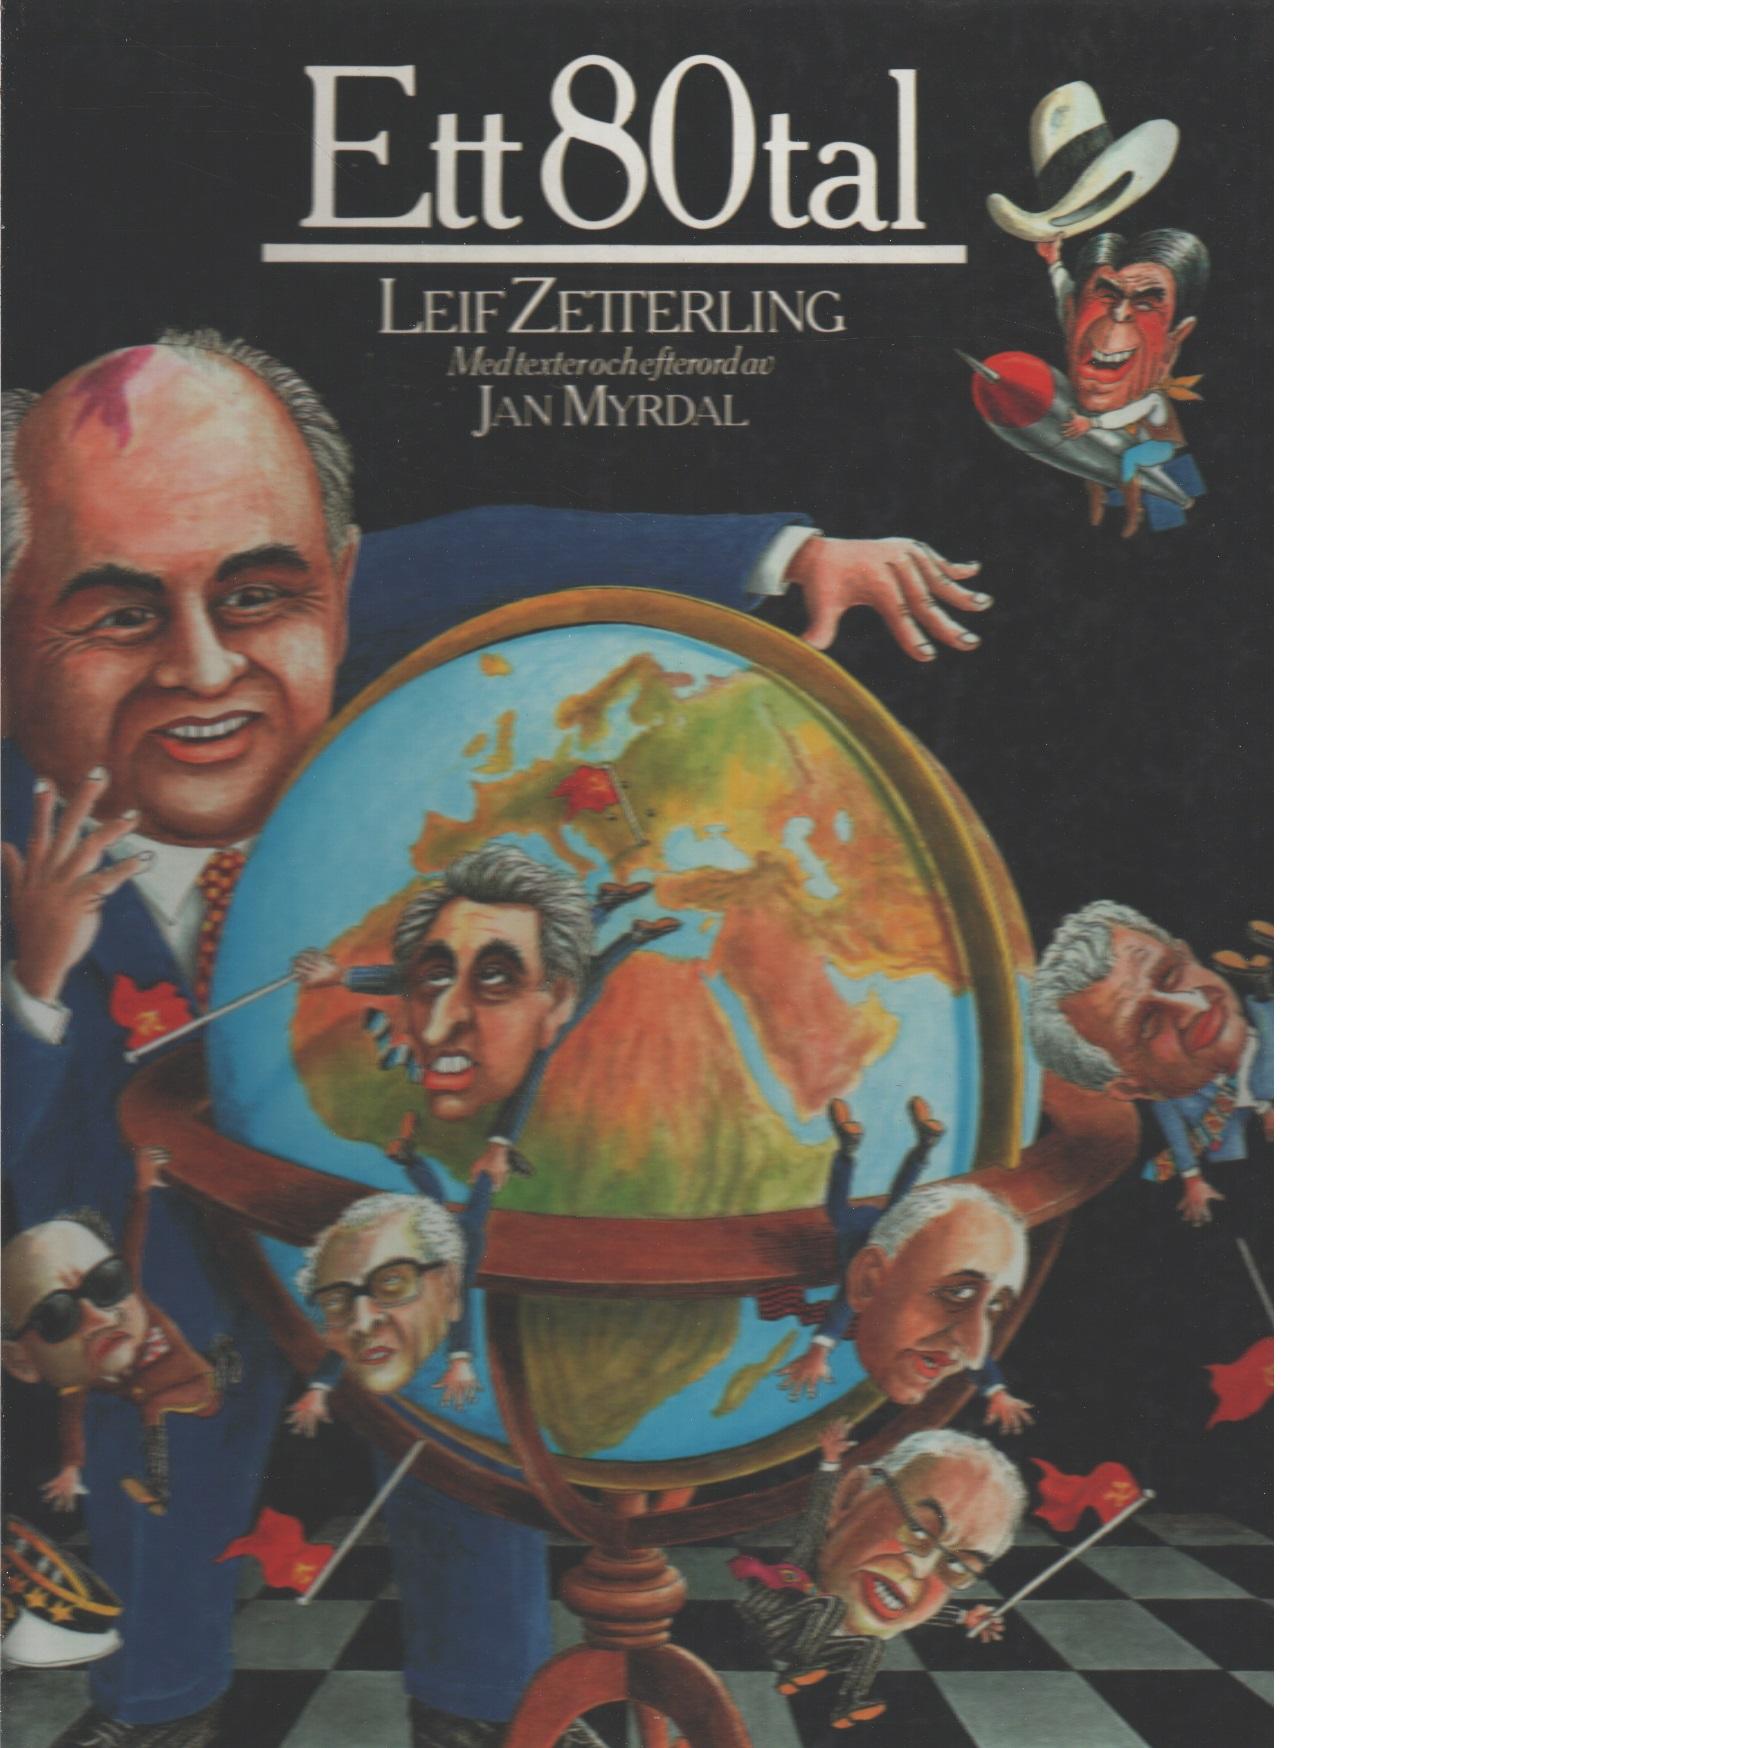 Ett 80tal / Leif Zetterling ; med texter och efterord av Jan Myrdal - Zetterling, Leif